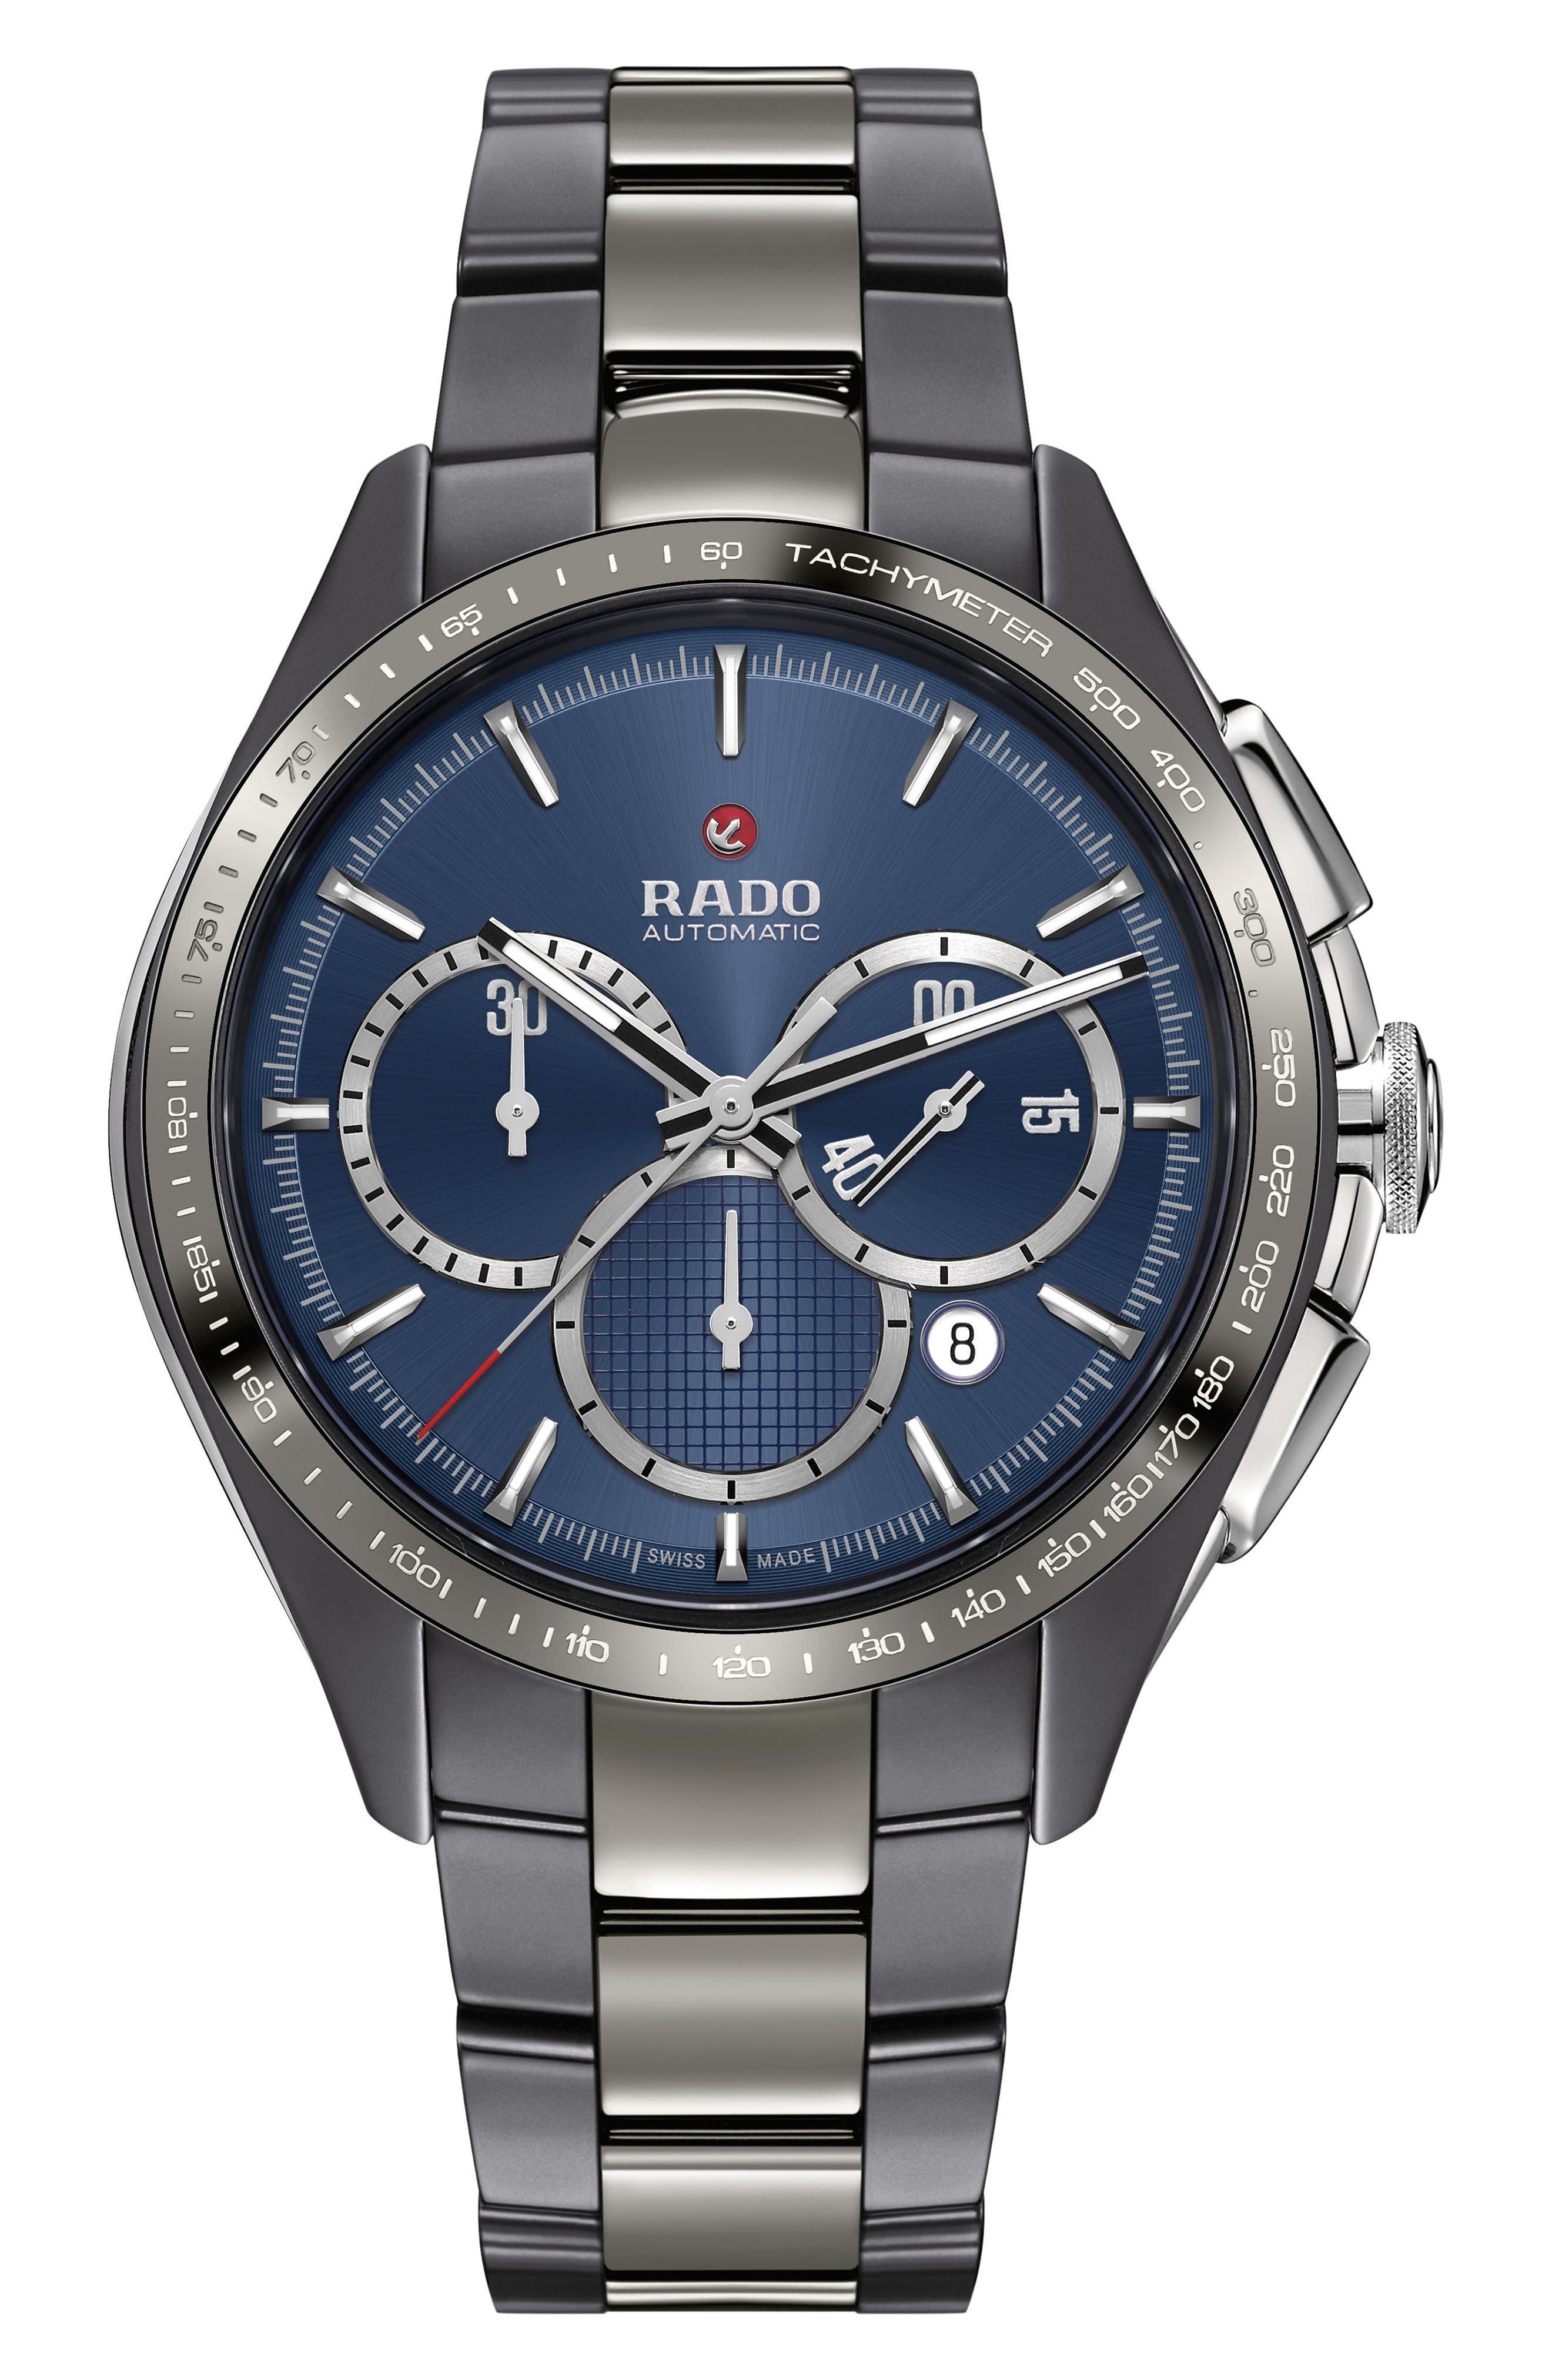 Main Image - RADO HyperChrome Match Point Automatic Chronograph Watch, 45mm